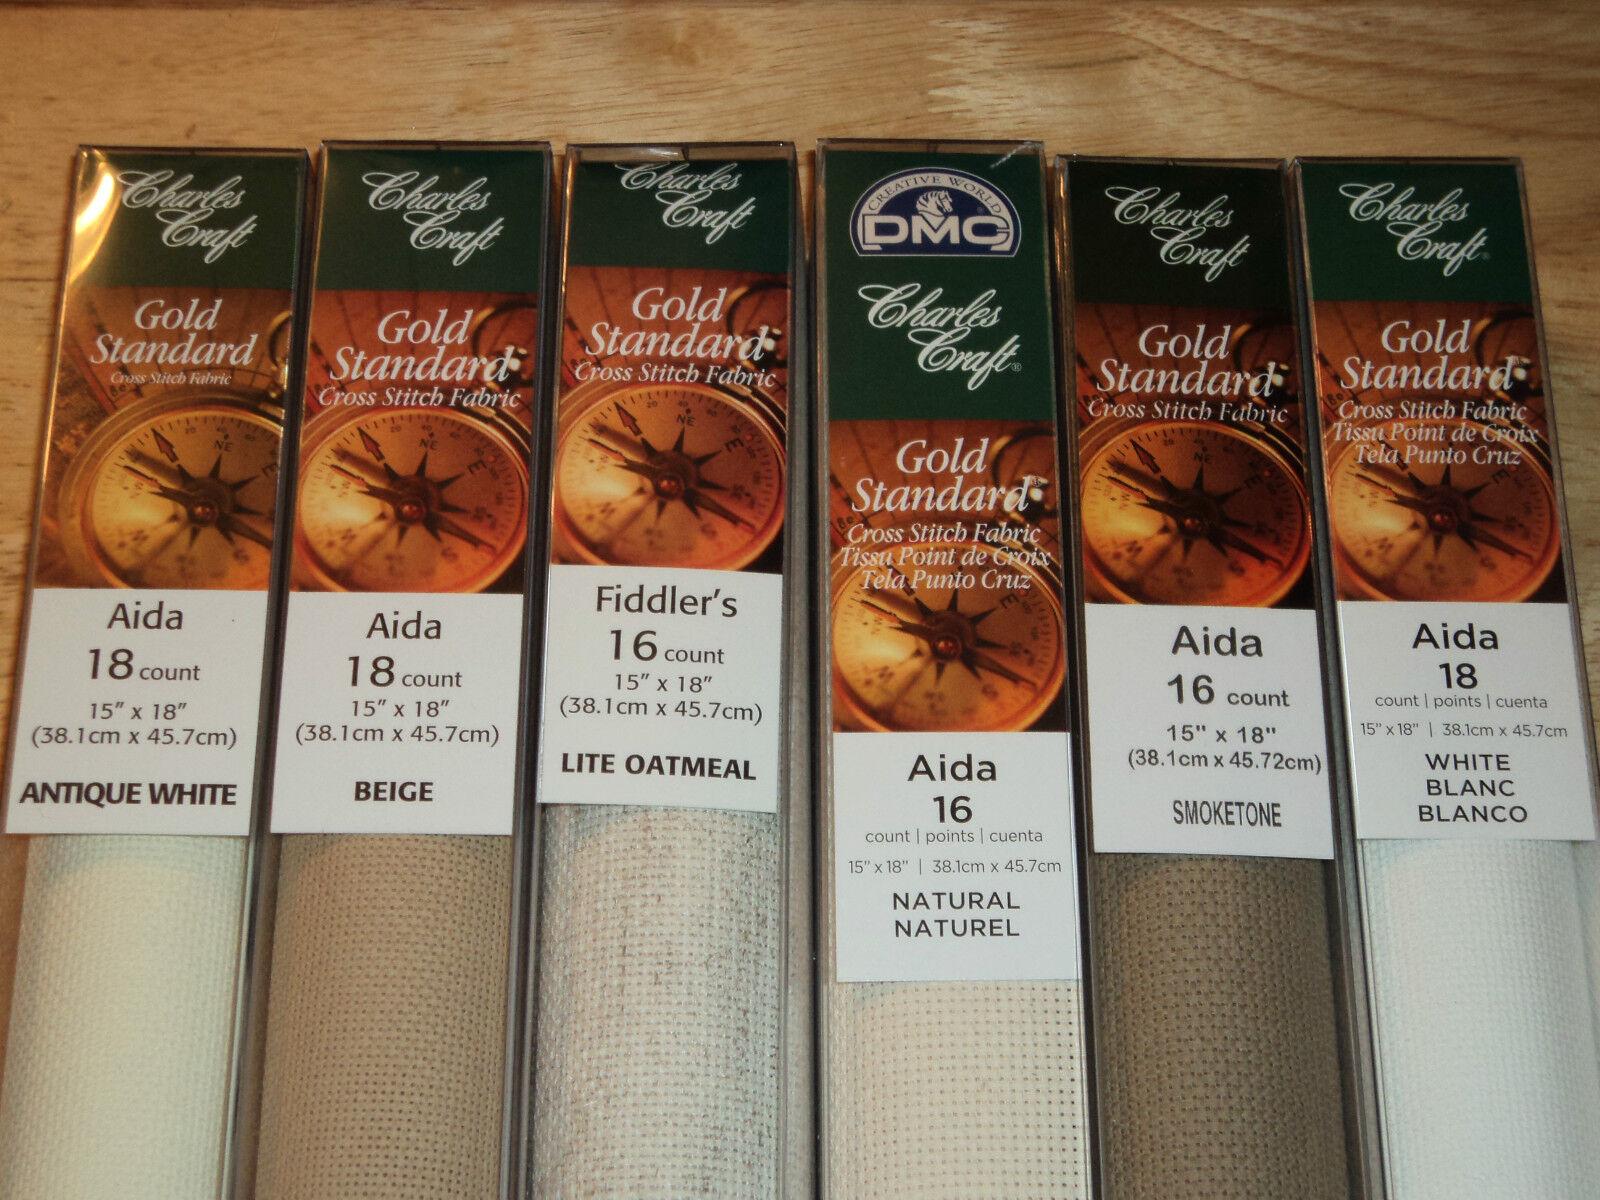 Brown Chocolate 12 x 18 Charles Craft 18 Count Aida Fabric